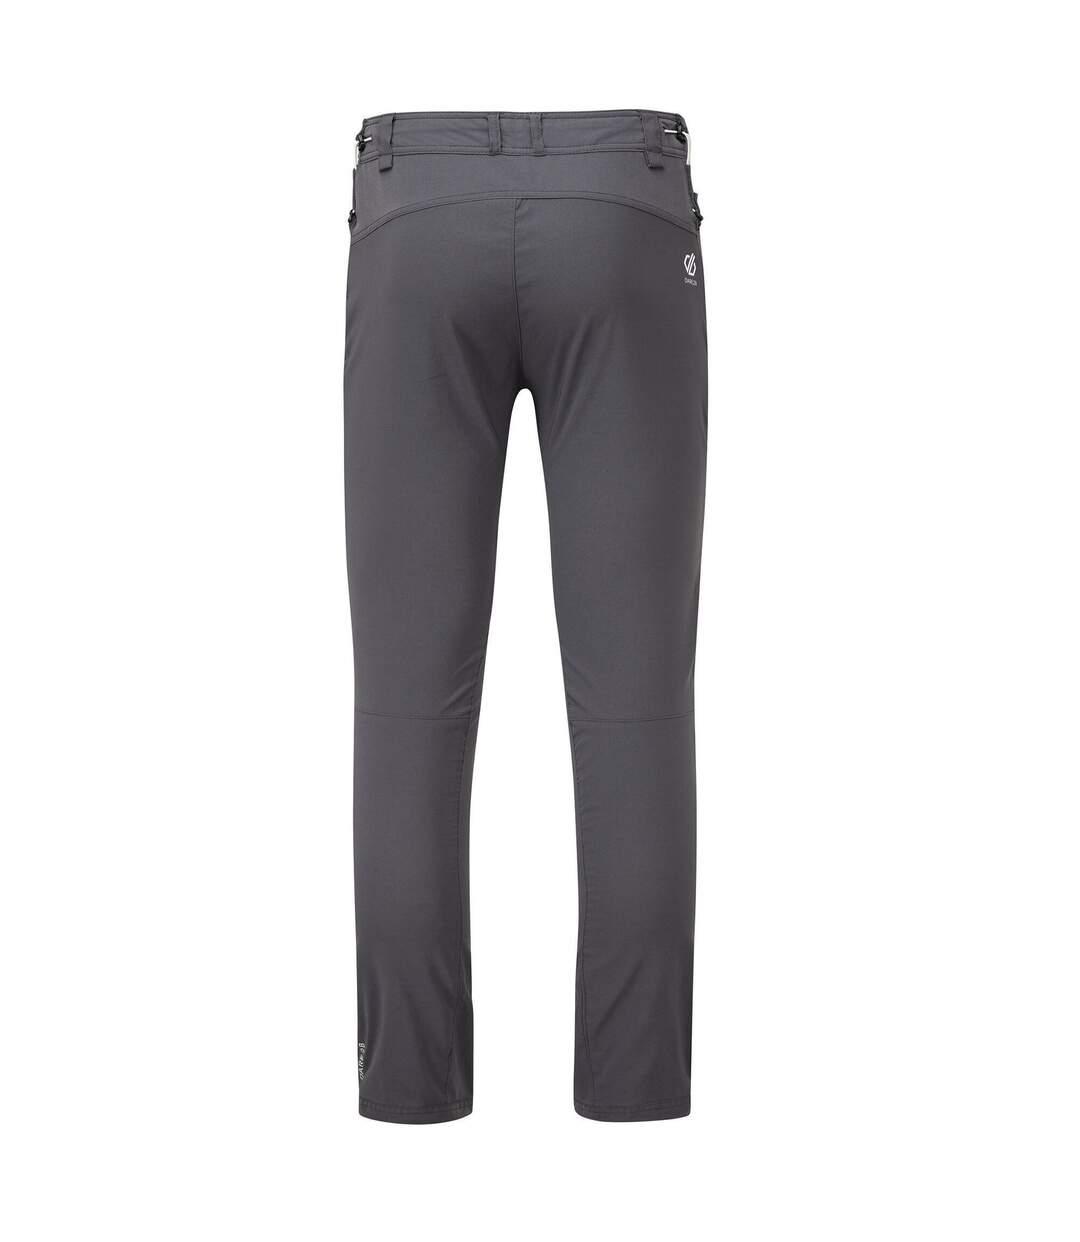 Dare 2b Mens Tuned In II Multi Pocket Walking Trousers (Ebony Grey) - UTRG4462